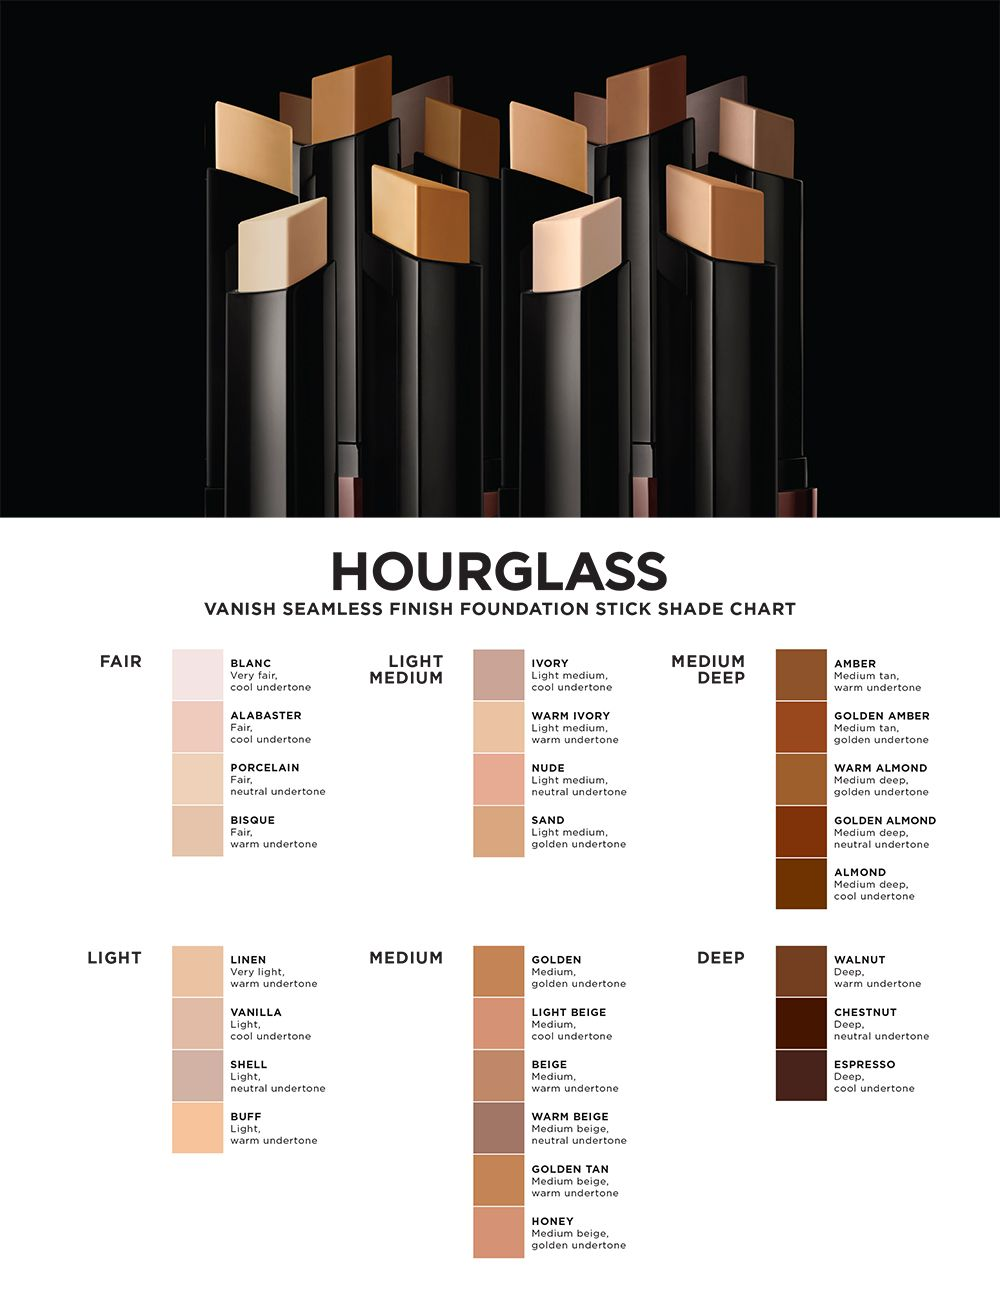 Buy Hourglass Vanish Seamless Finish Foundation Stick Sephora Malaysia Stick Foundation Hourglass Vanish Foundation Hourglass Stick Foundation